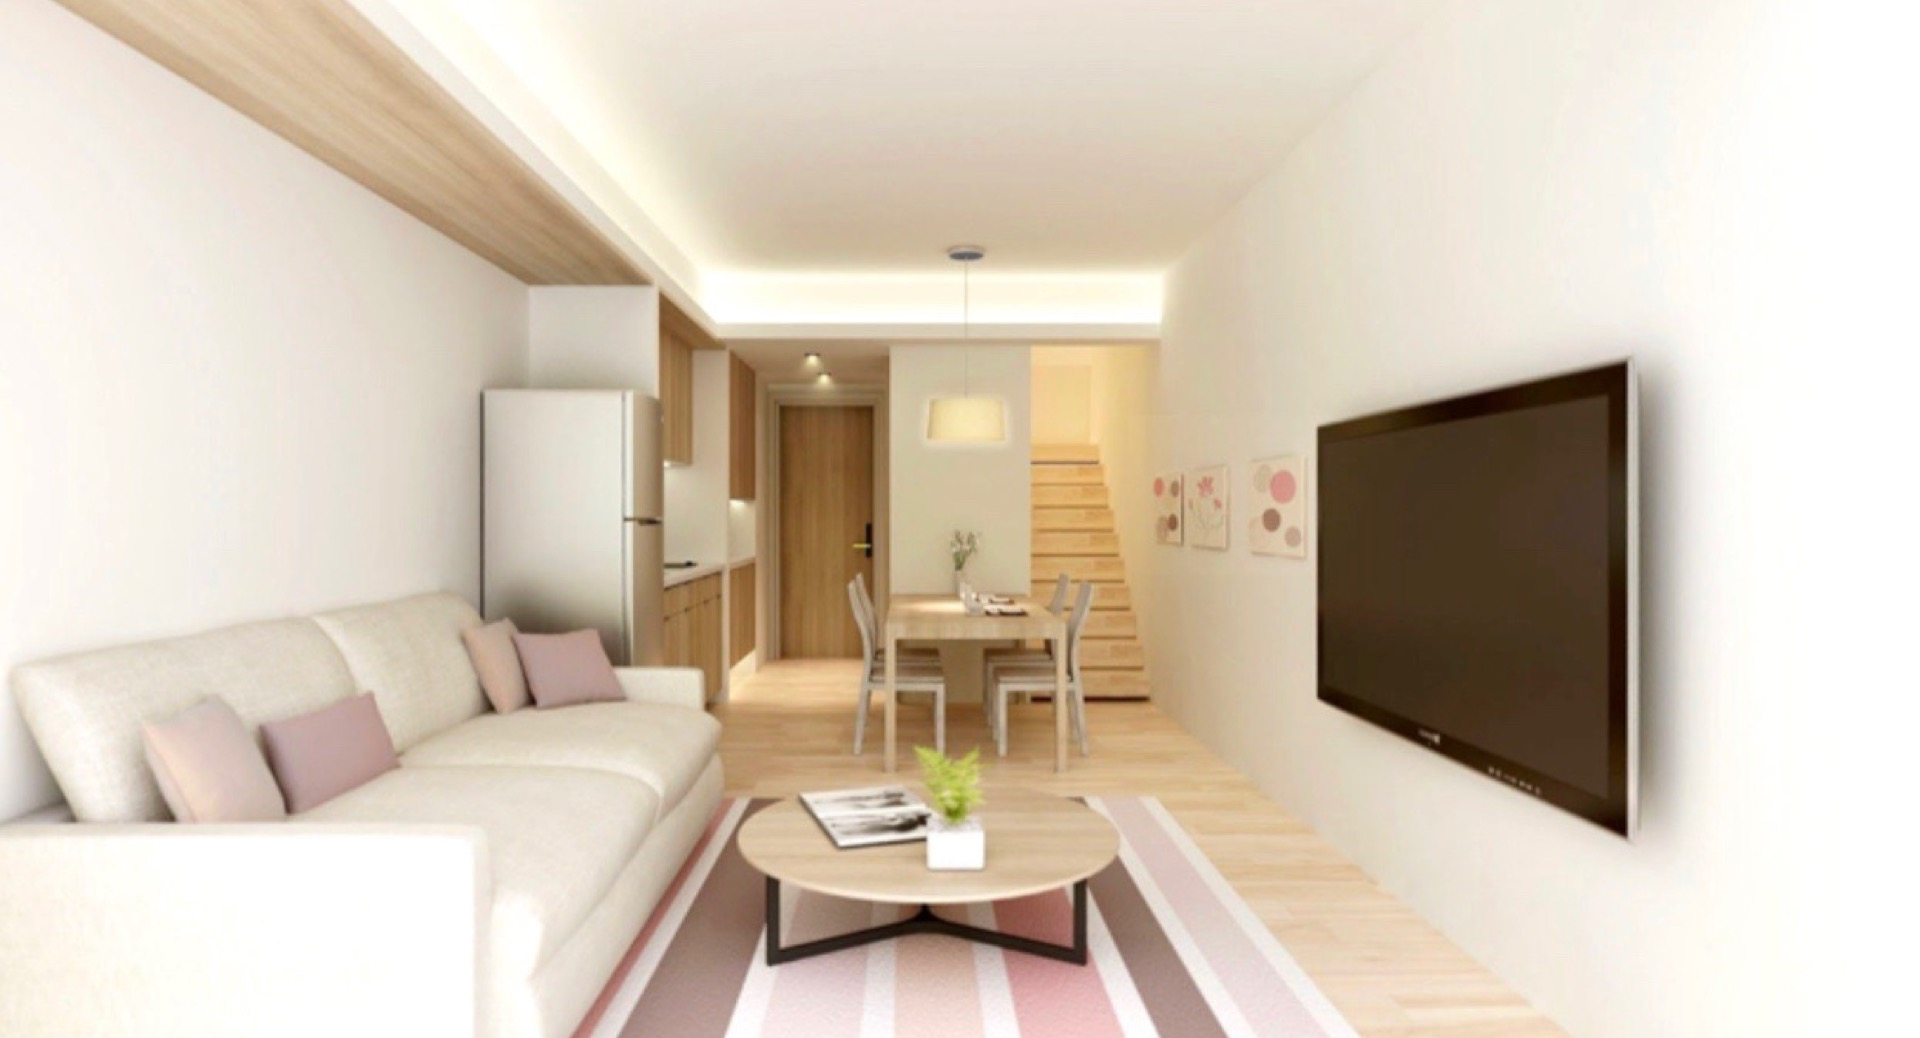 德築-DEZU-project-Zuyin-architecture-building-3Drendering-2